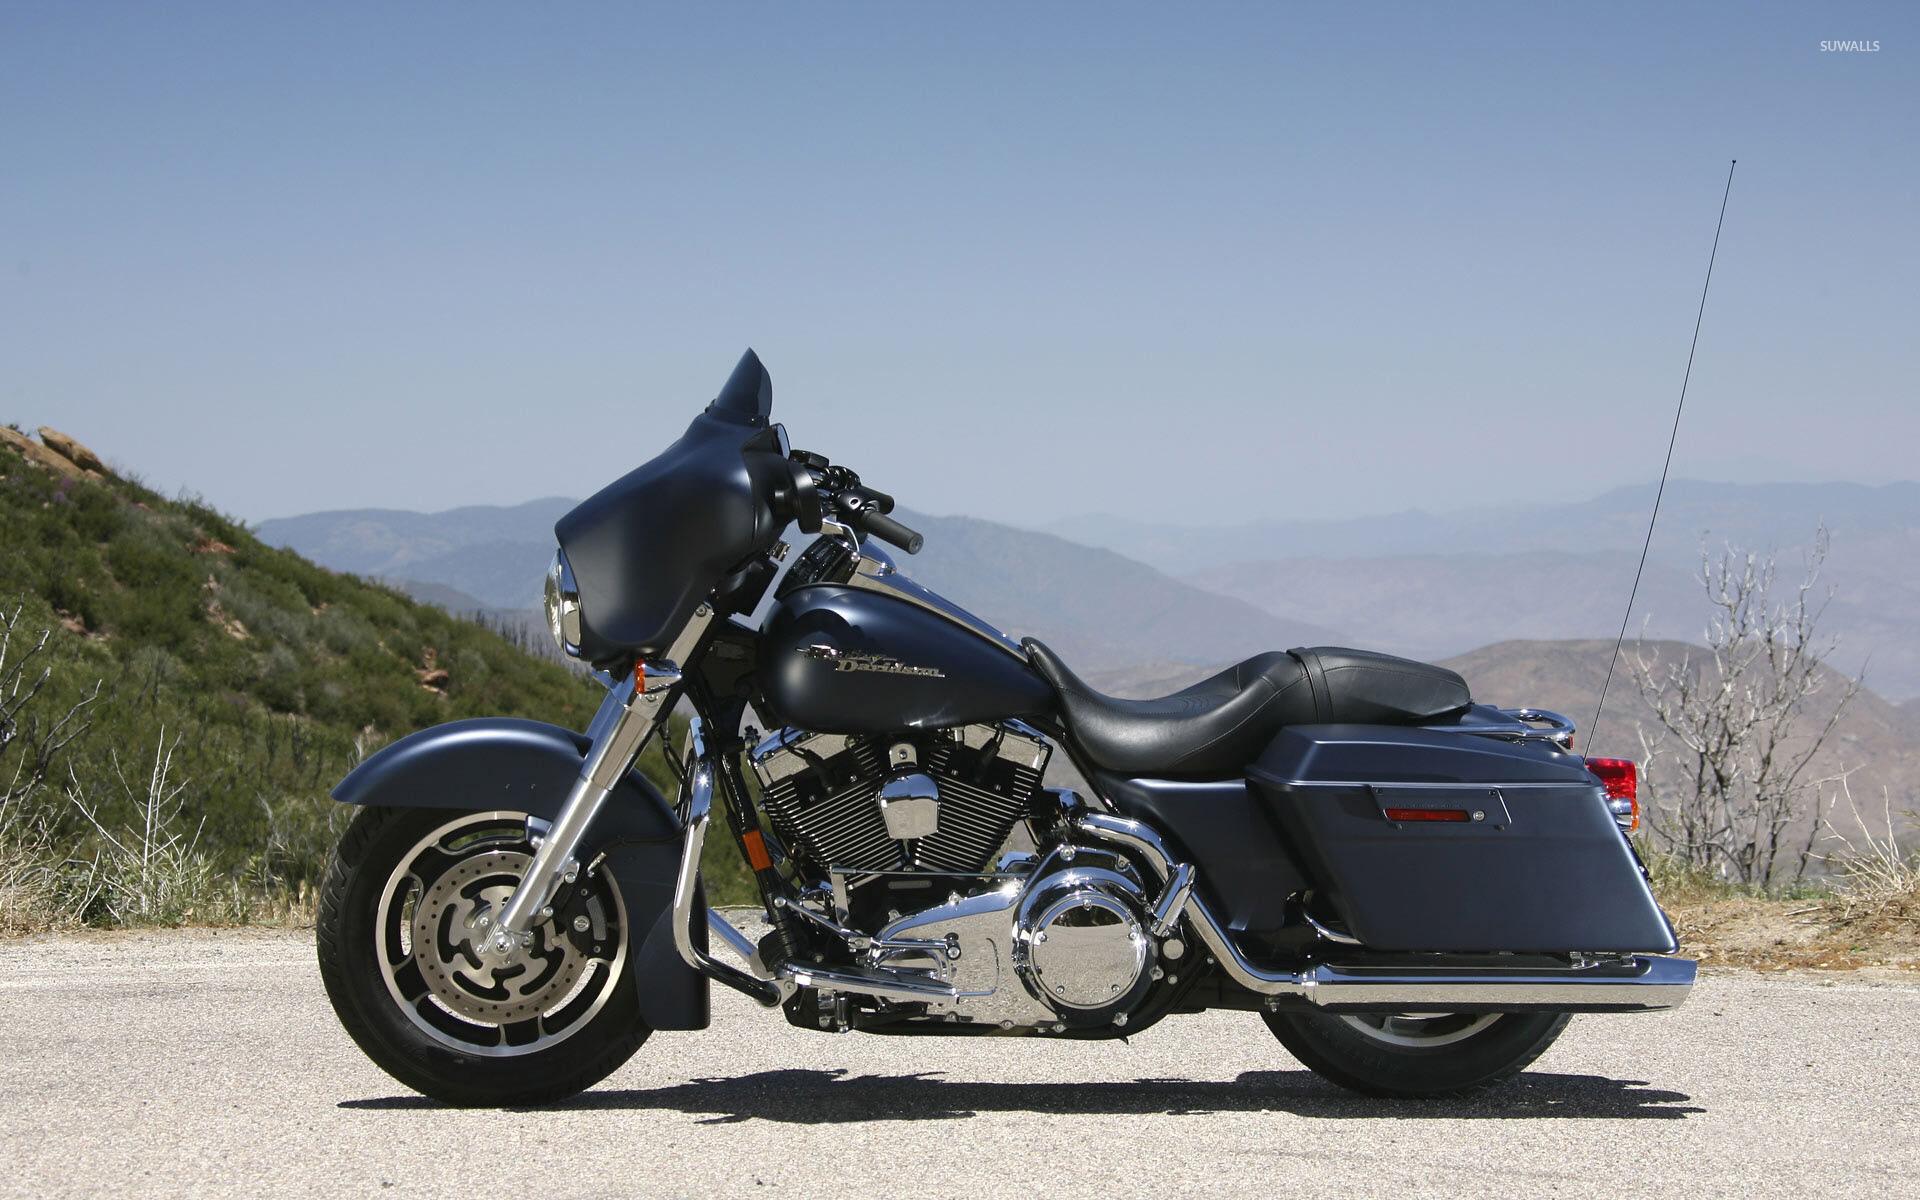 motorcycle harley street glide wallpaper -#main